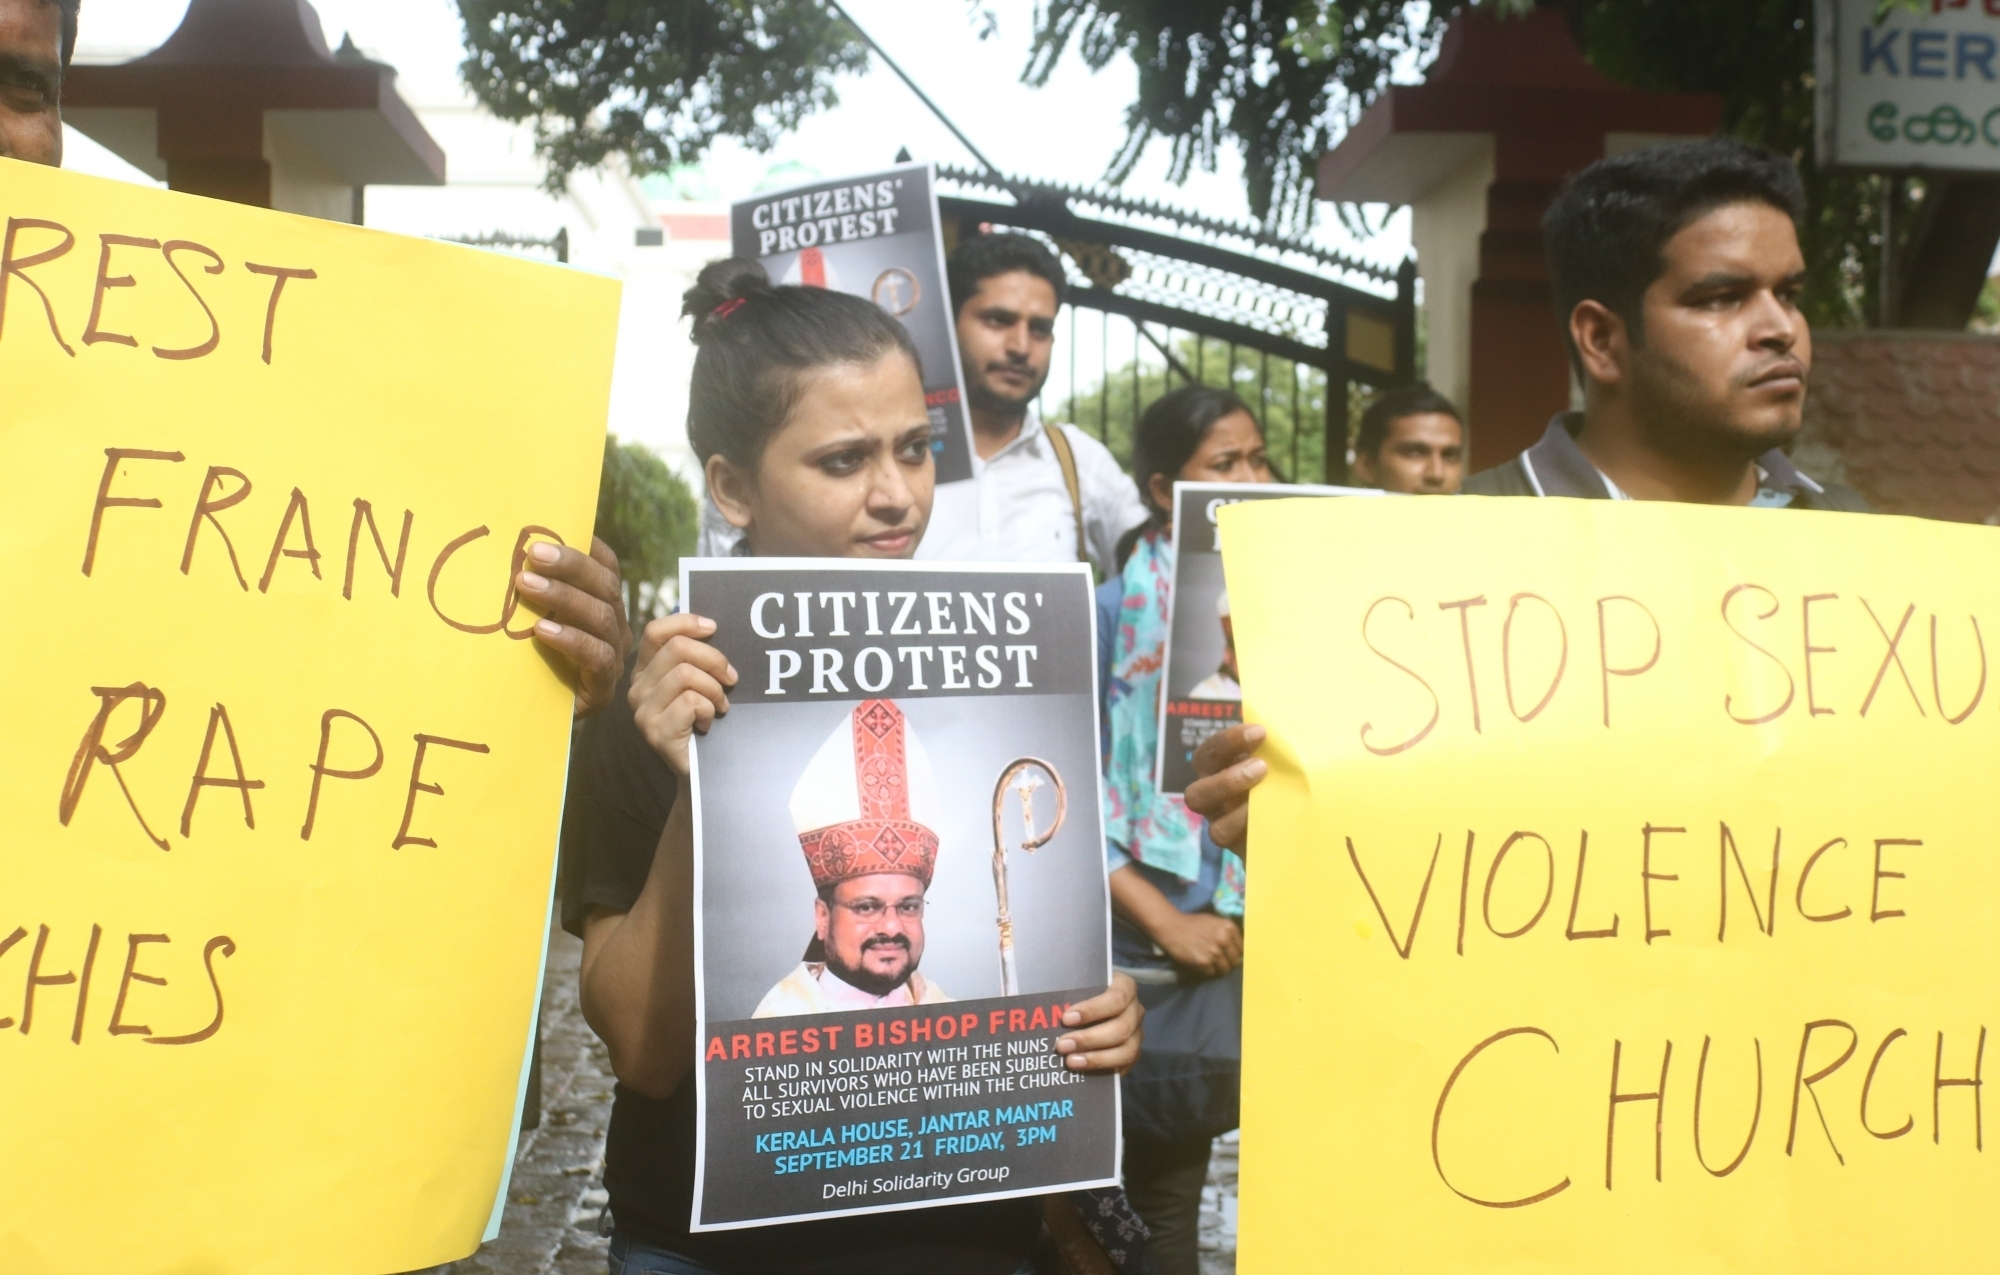 A protest against Franco Mulakkal. Photo credit: IANS